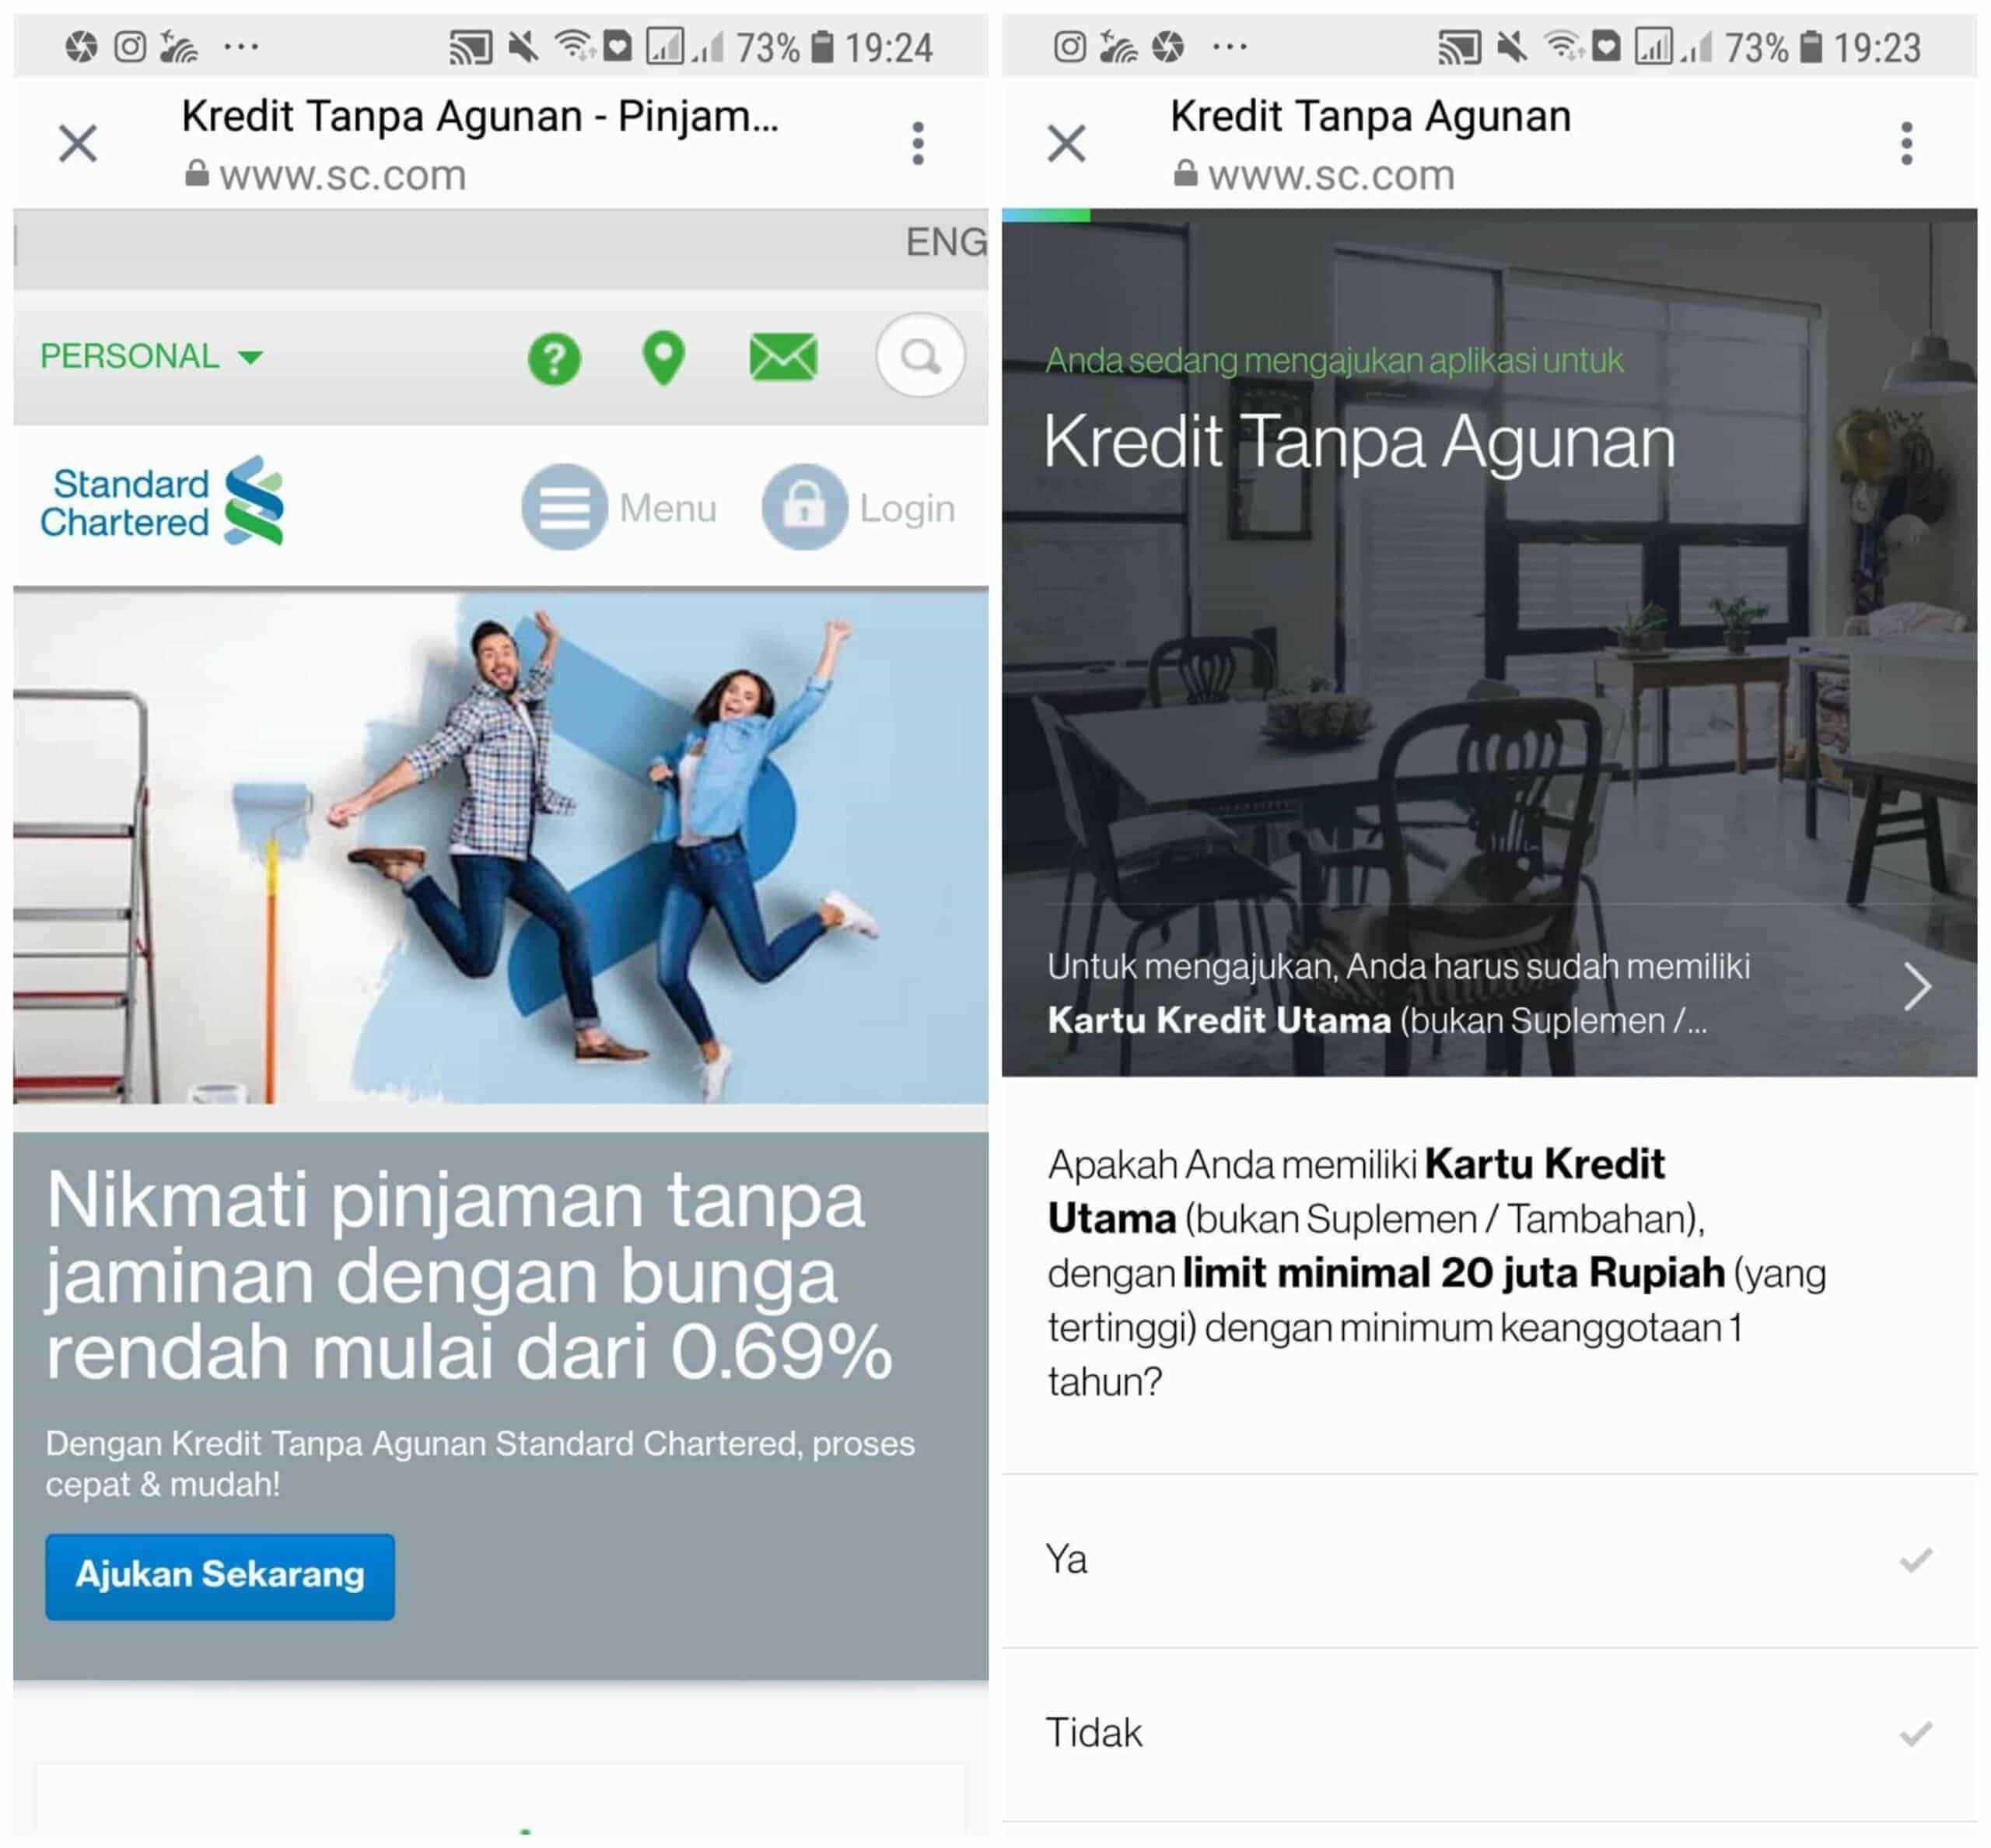 KTA SCB Online 2019